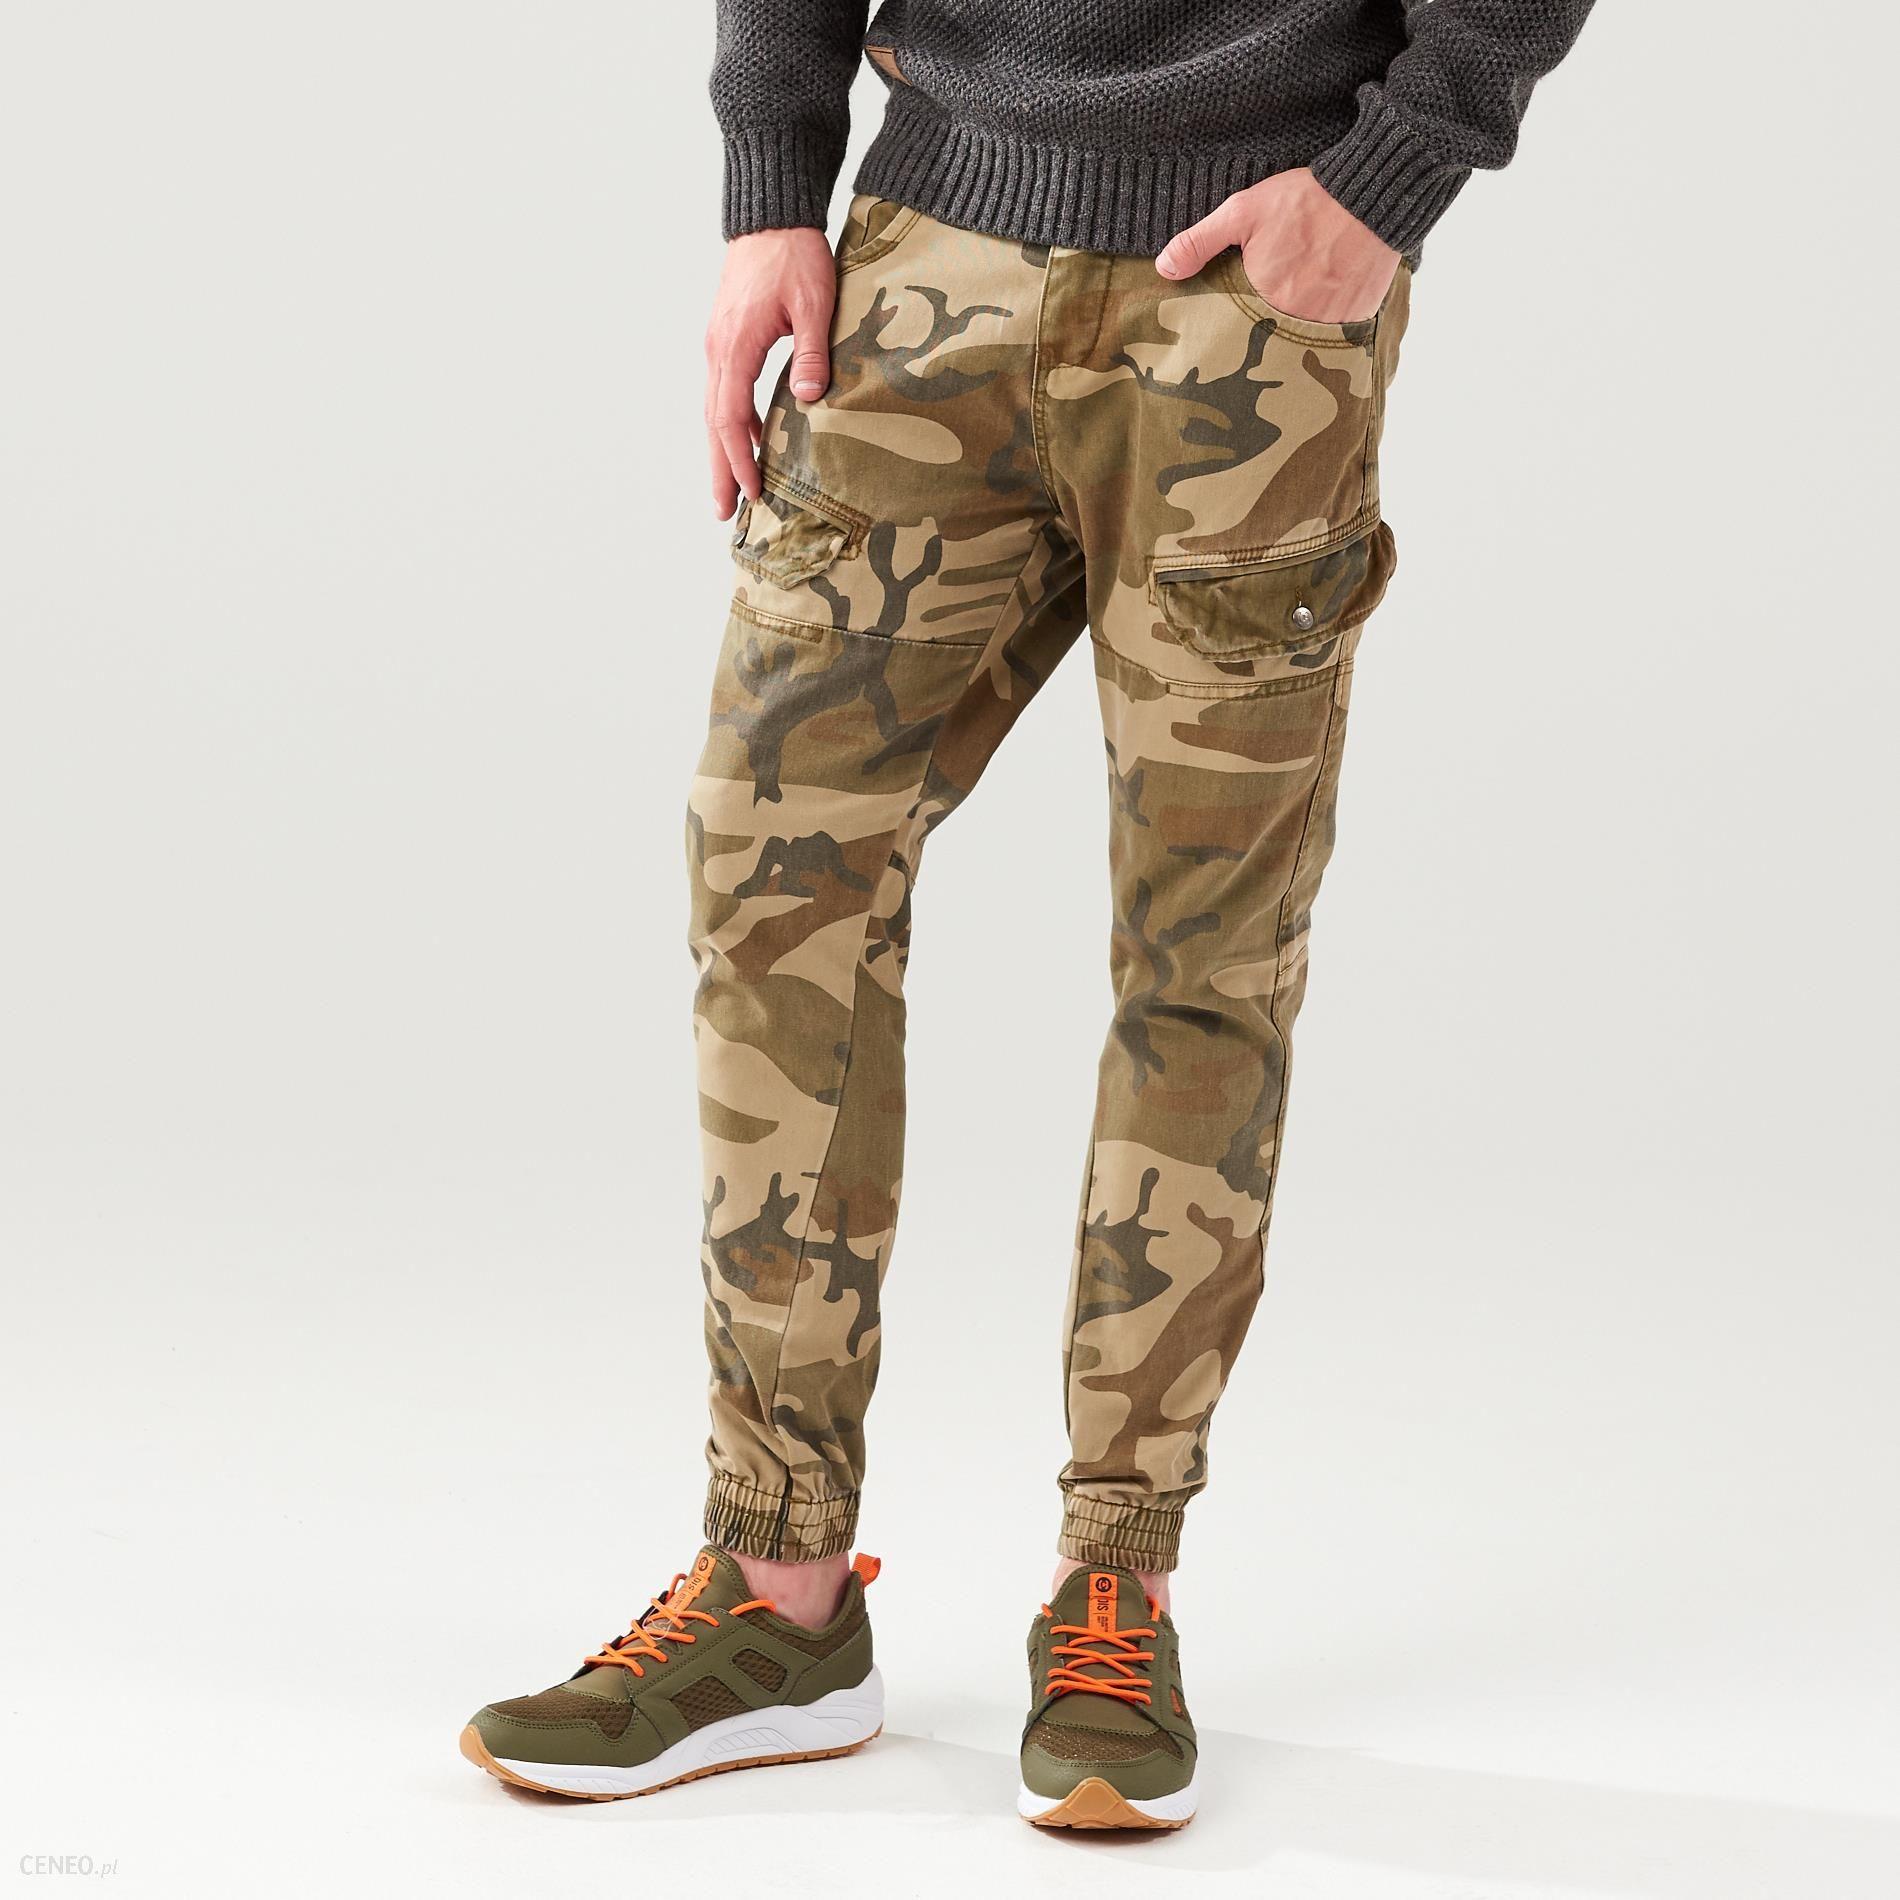 Cropp Spodnie moro slim fit Zielony damska